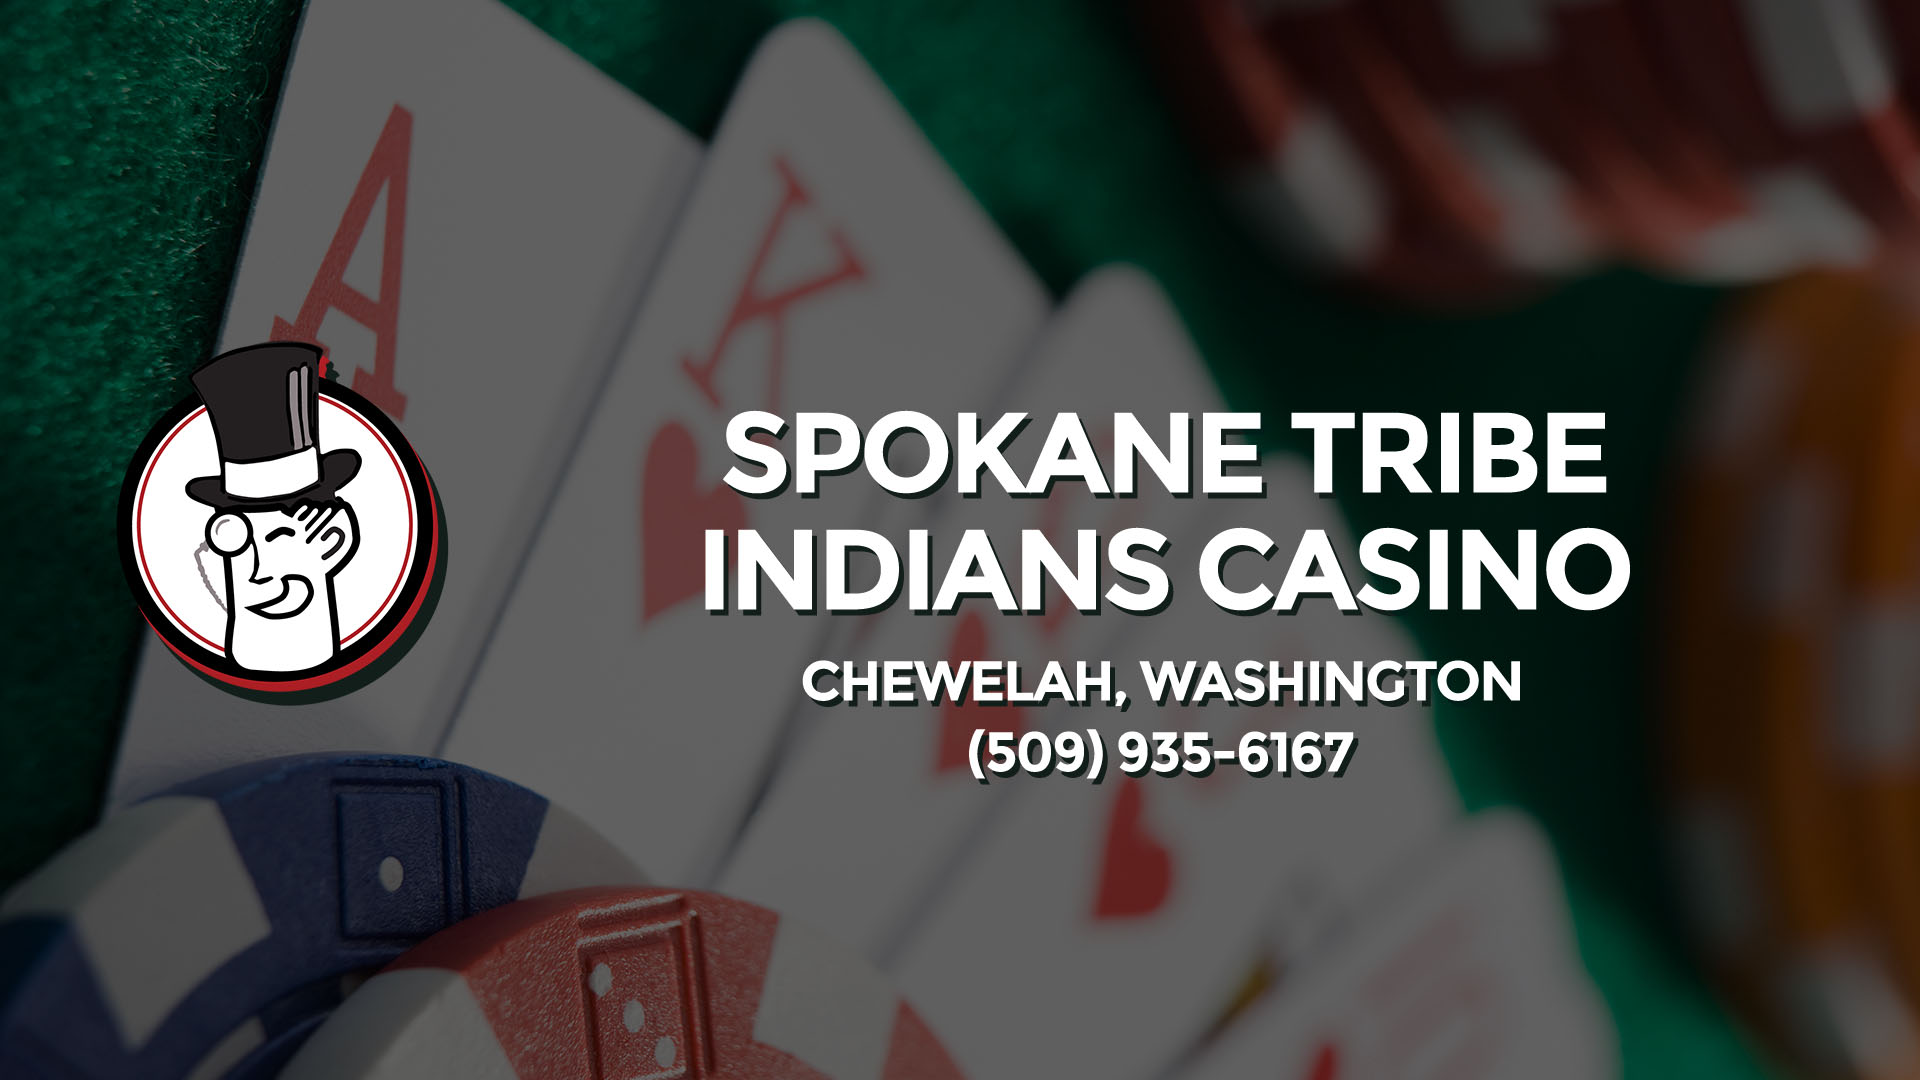 SPOKANE TRIBE-INDIANS CASINO CHEWELAH WA